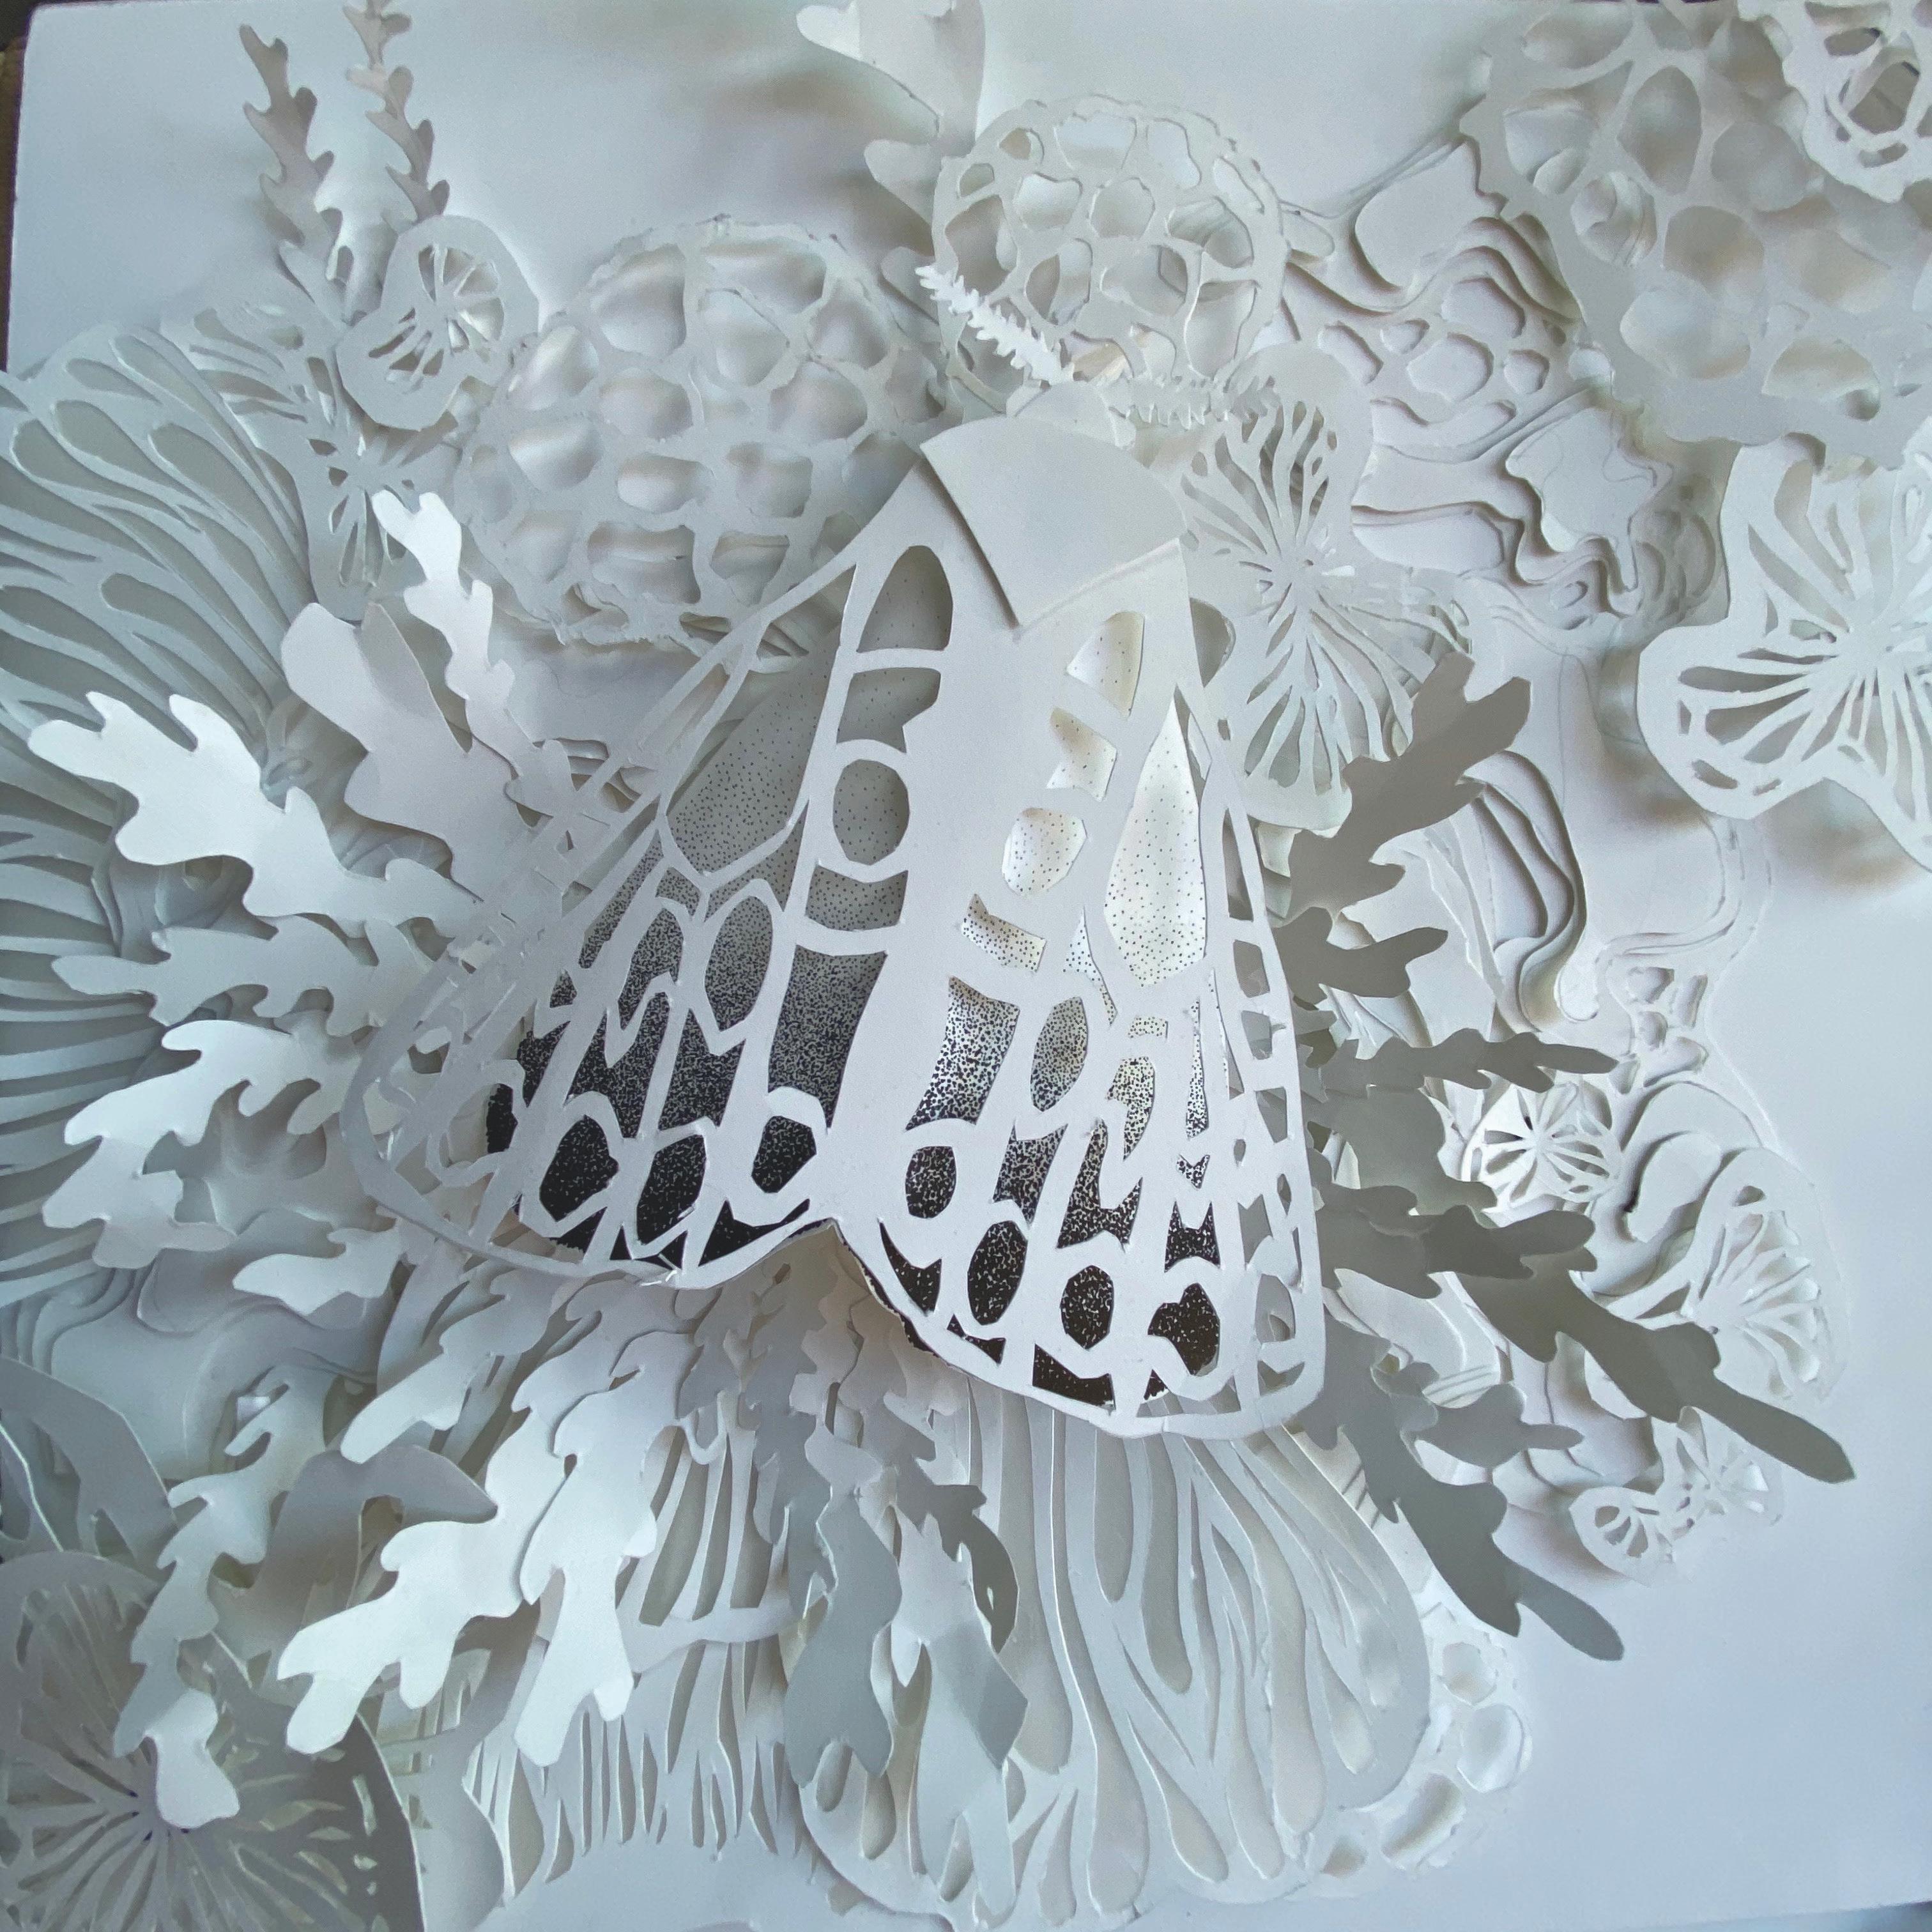 Atelier Papercut |